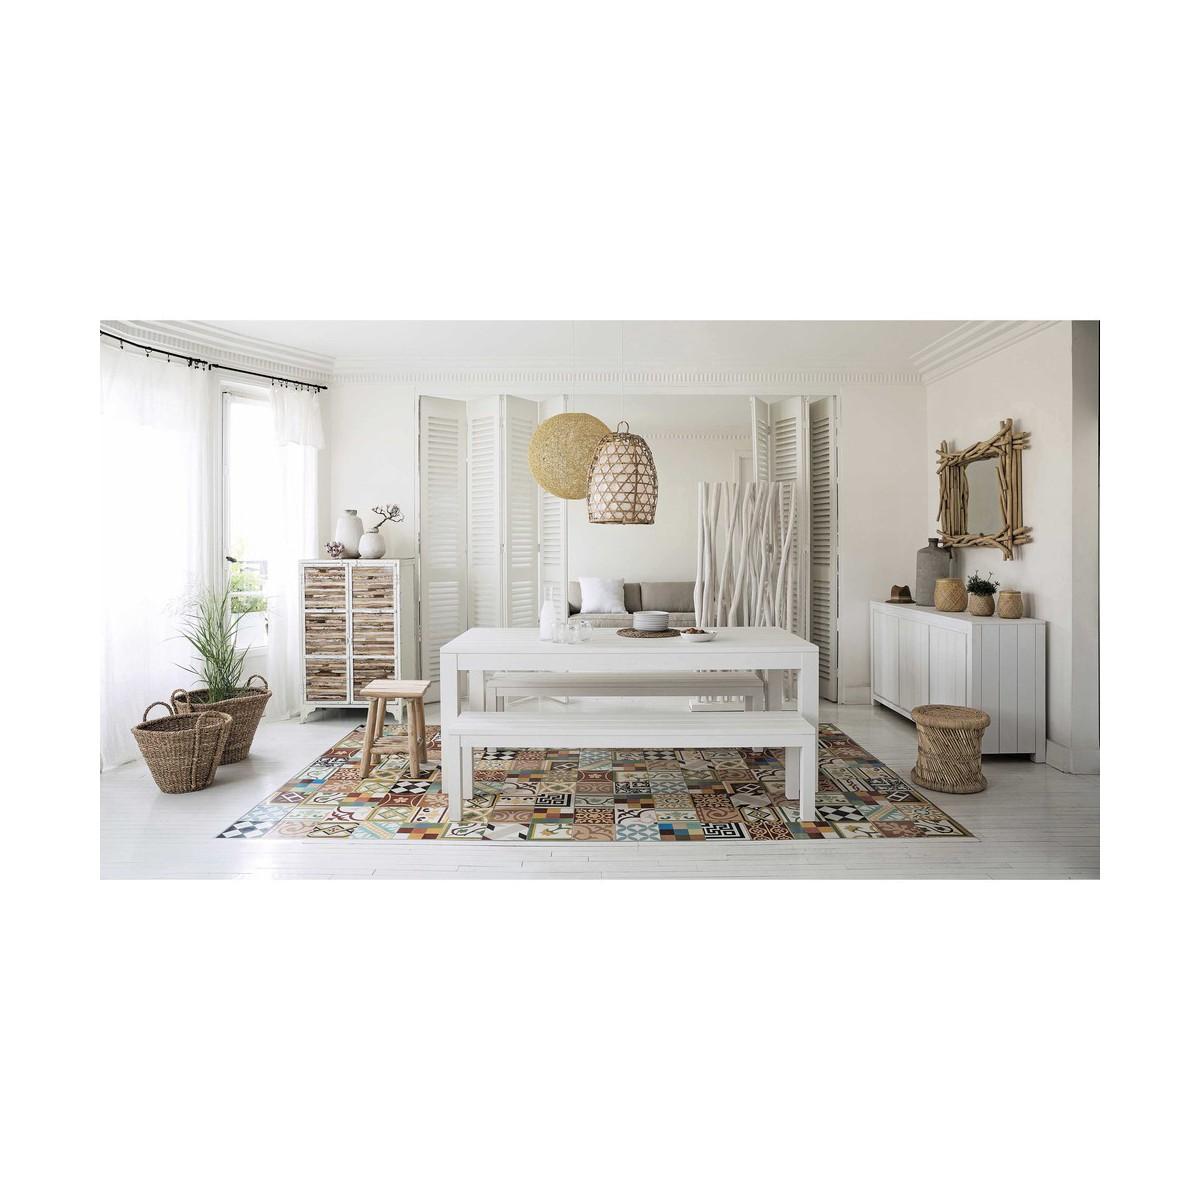 Table de salle manger en bois massif blanche l 160 cm for Salle a manger en l